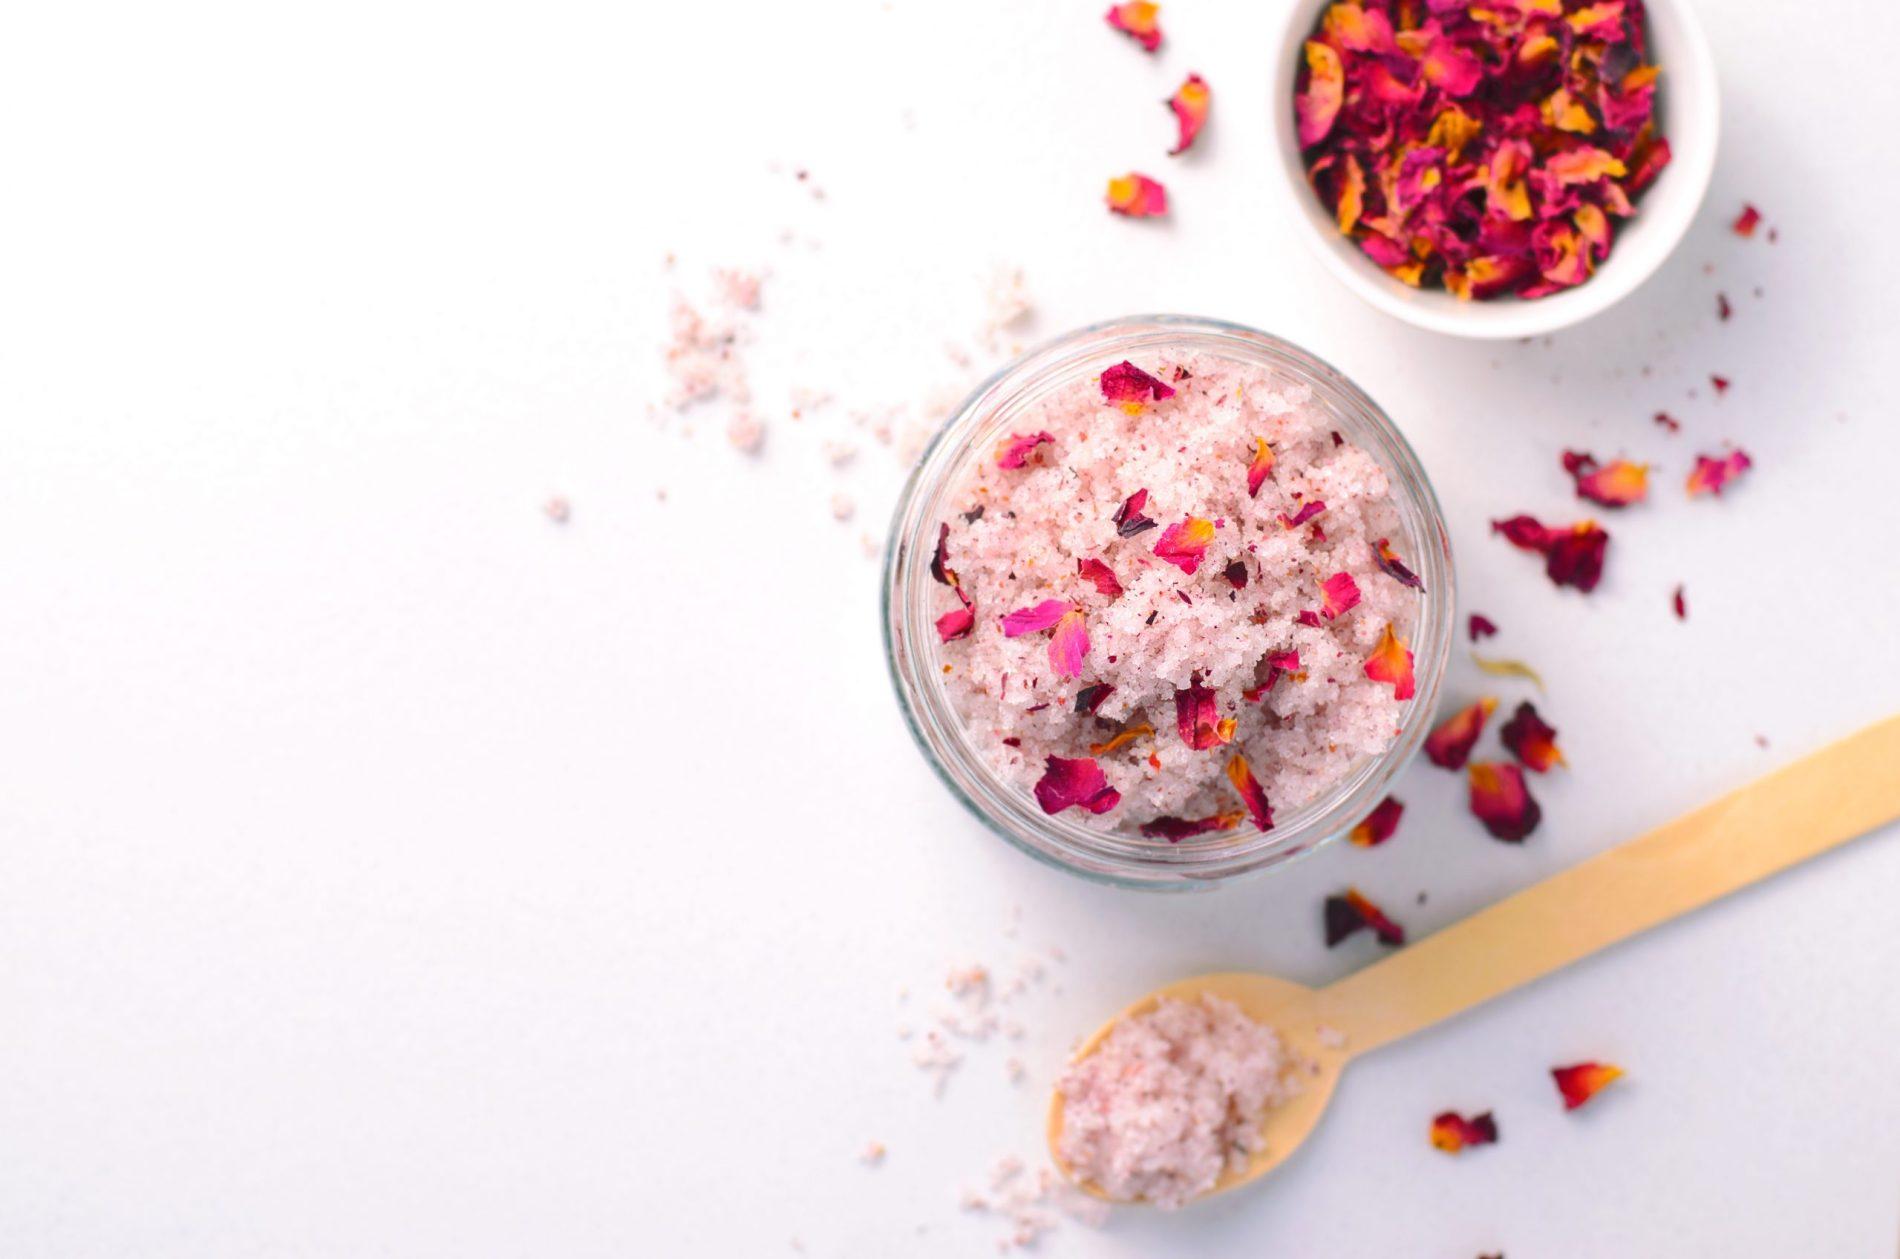 DIY Natural Rose Sugar Body Scrub For Youthful Skin